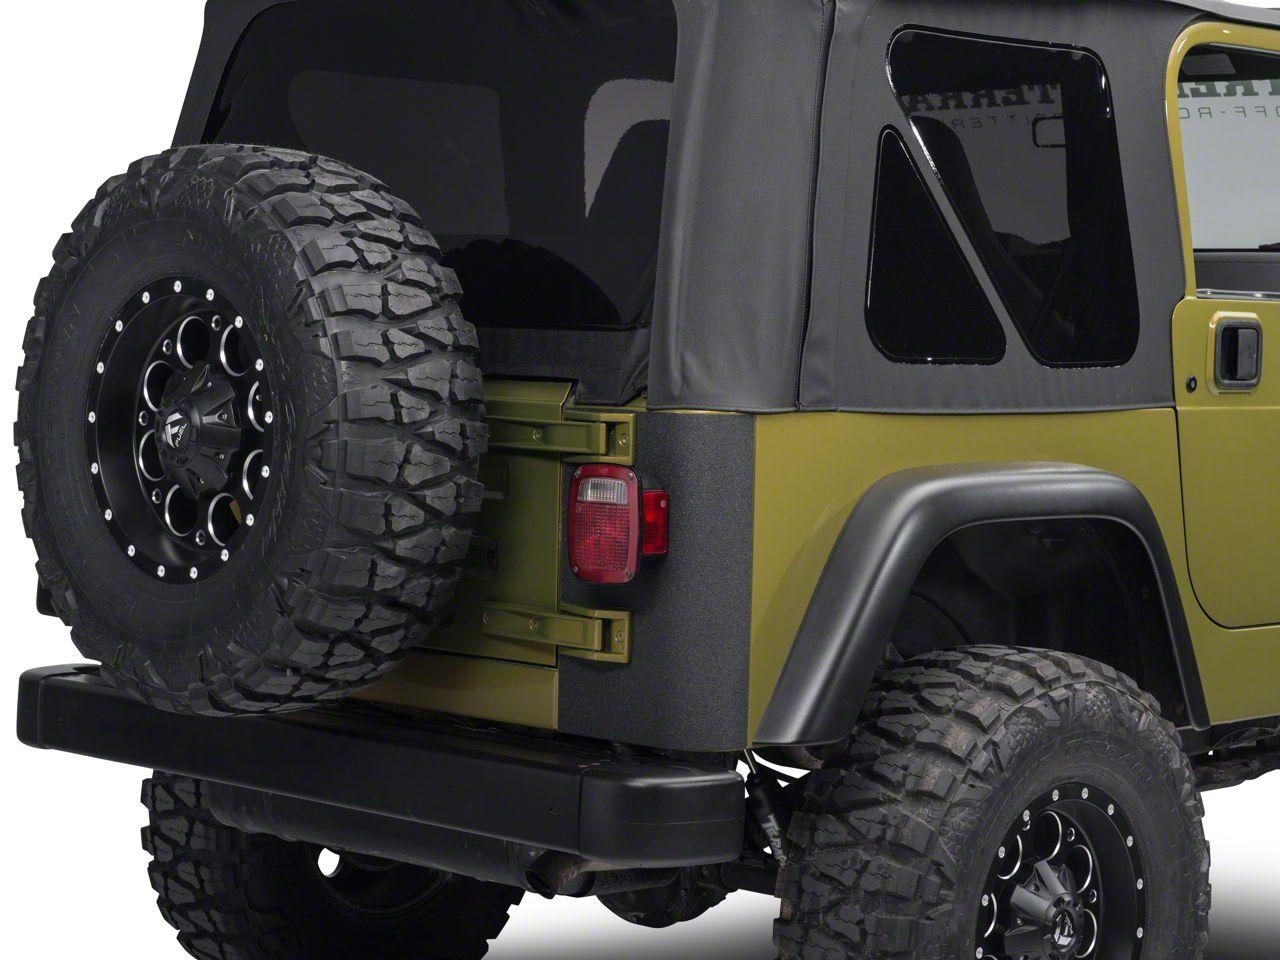 Barricade Rear Corner Body Shield Decal - Black (97-06 Jeep Wrangler TJ)